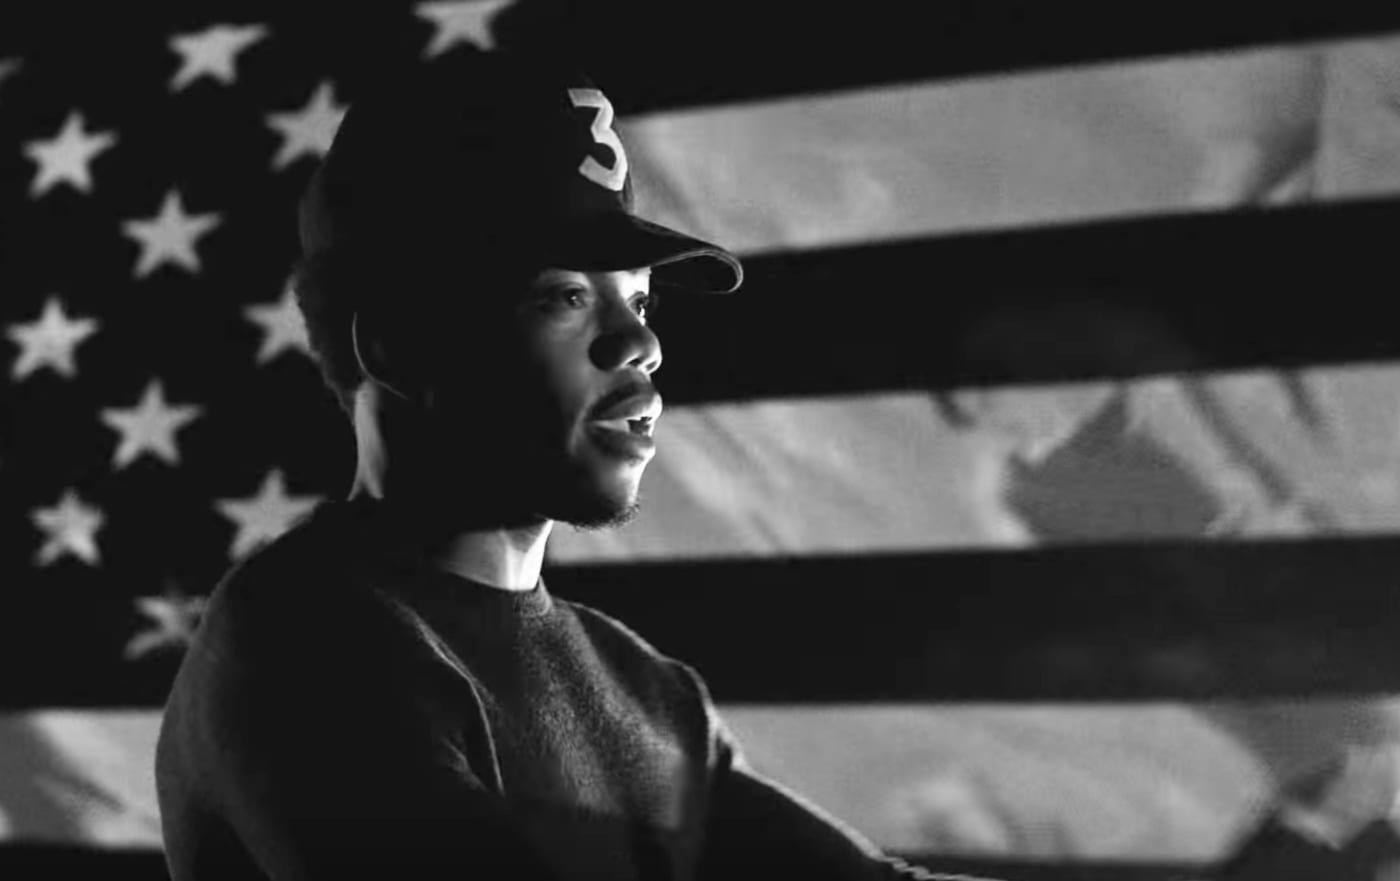 Chance The Rapper voter registration